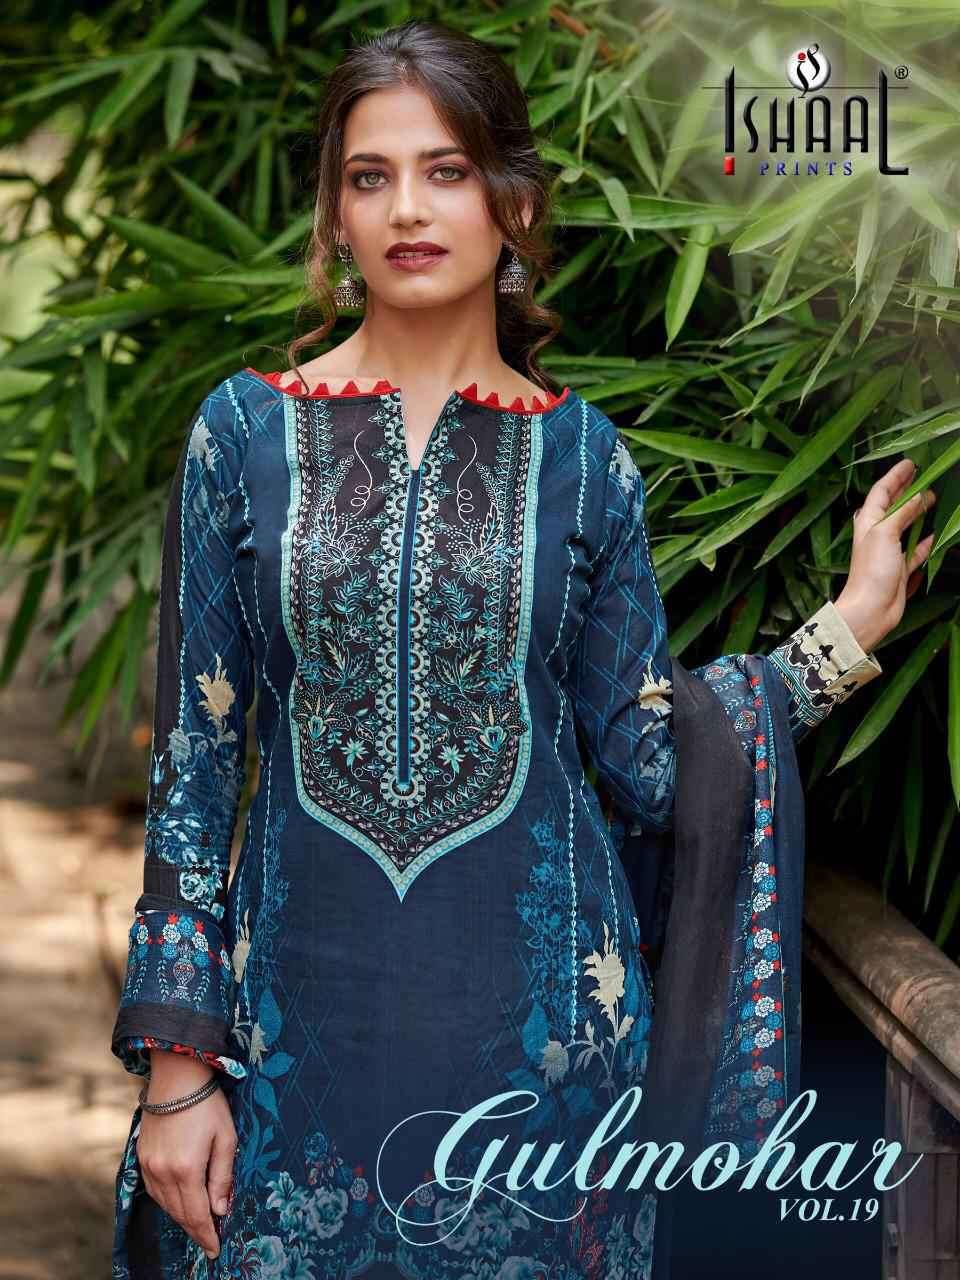 Ishaal Prints Gulmohar Vol 19 Printed Cotton Dress Material Catalog Wholesale Price